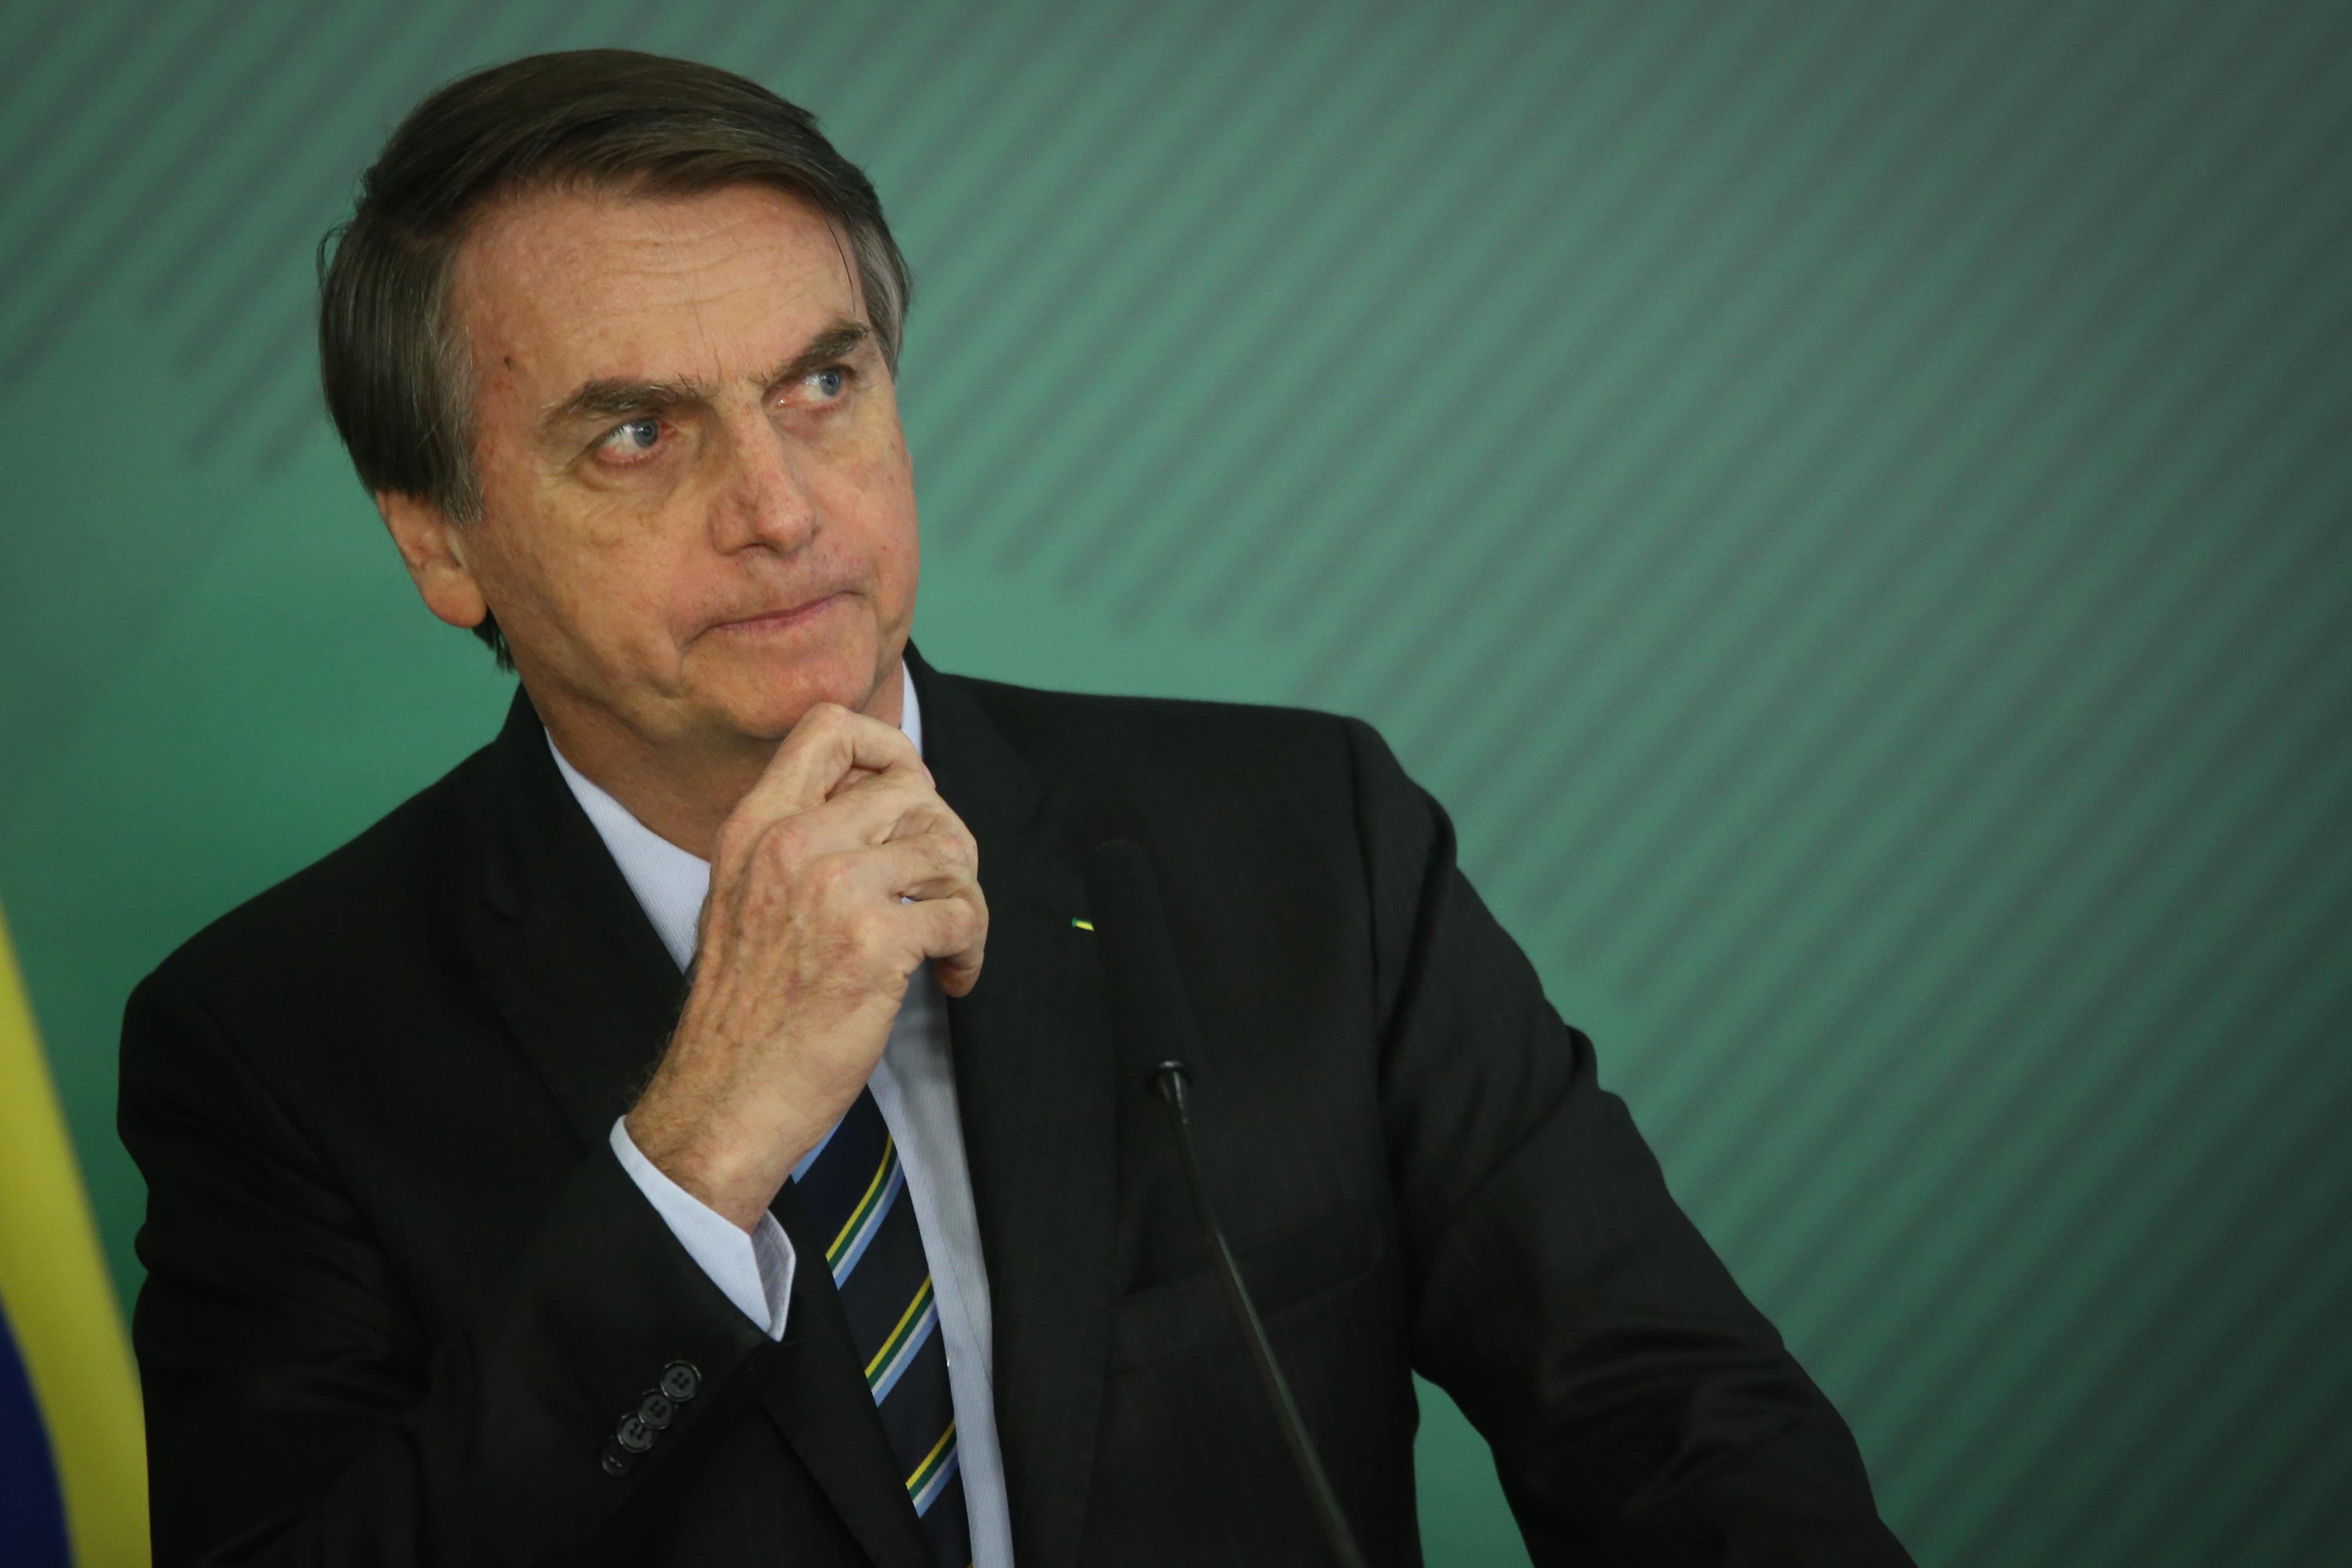 Brazil's Far-Right President Tweeted Golden Shower Video To Push Anti-LGBTQ Views